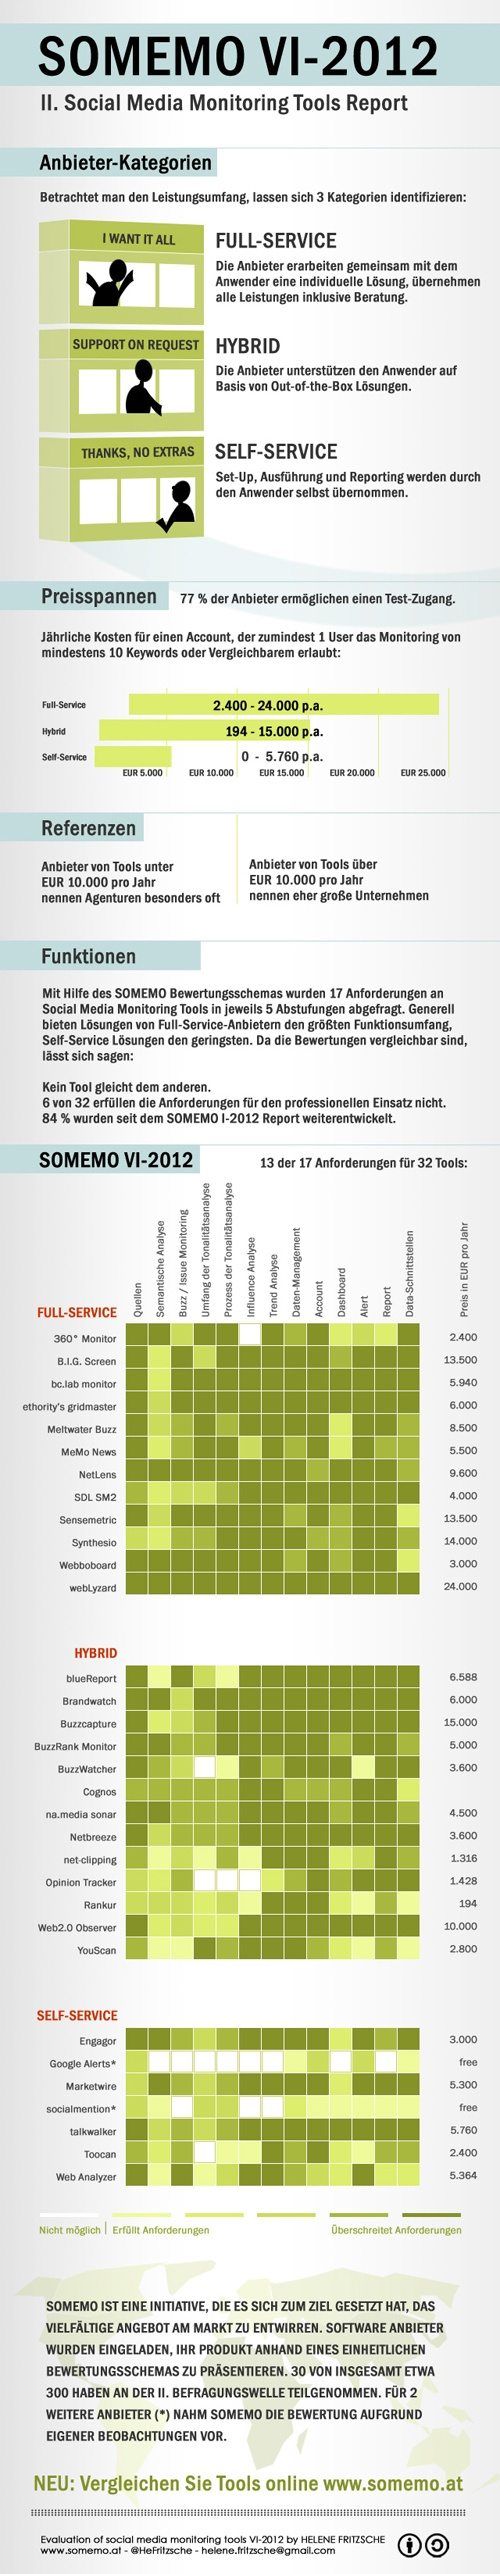 Social Media Monitoring Tools Report  #hmmh #socialmedia #monitoring